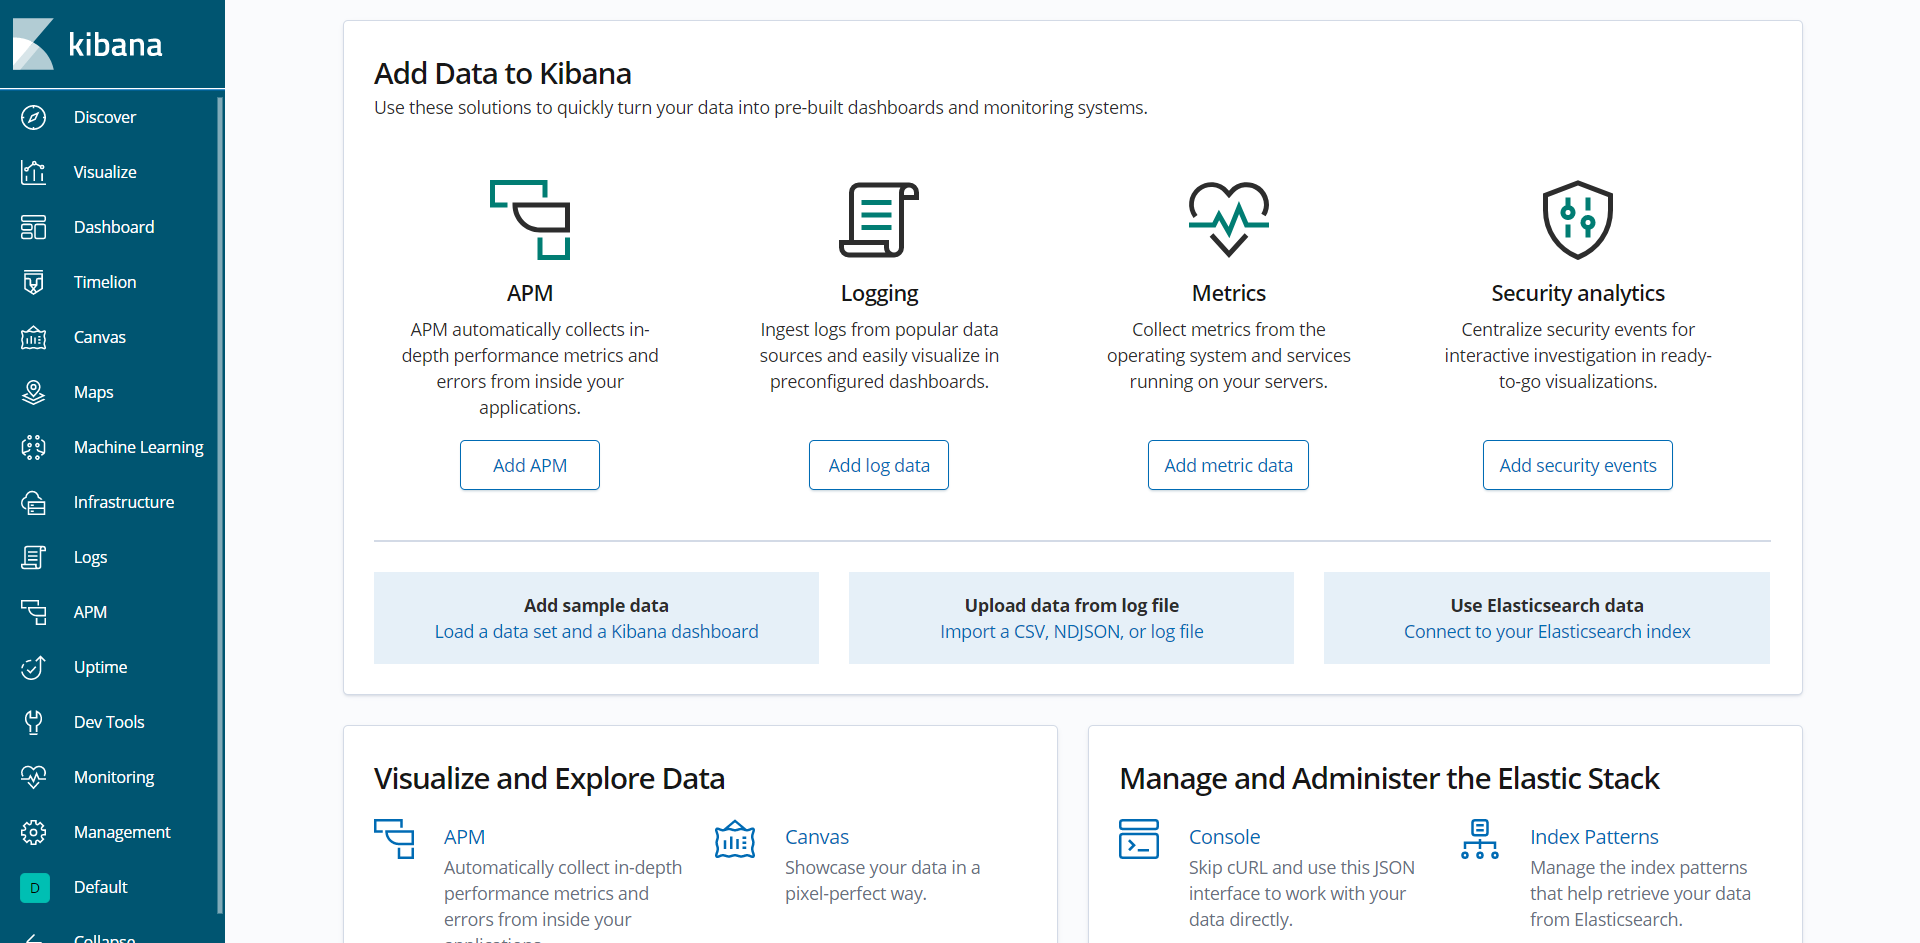 Kibana - Default Welcome Page